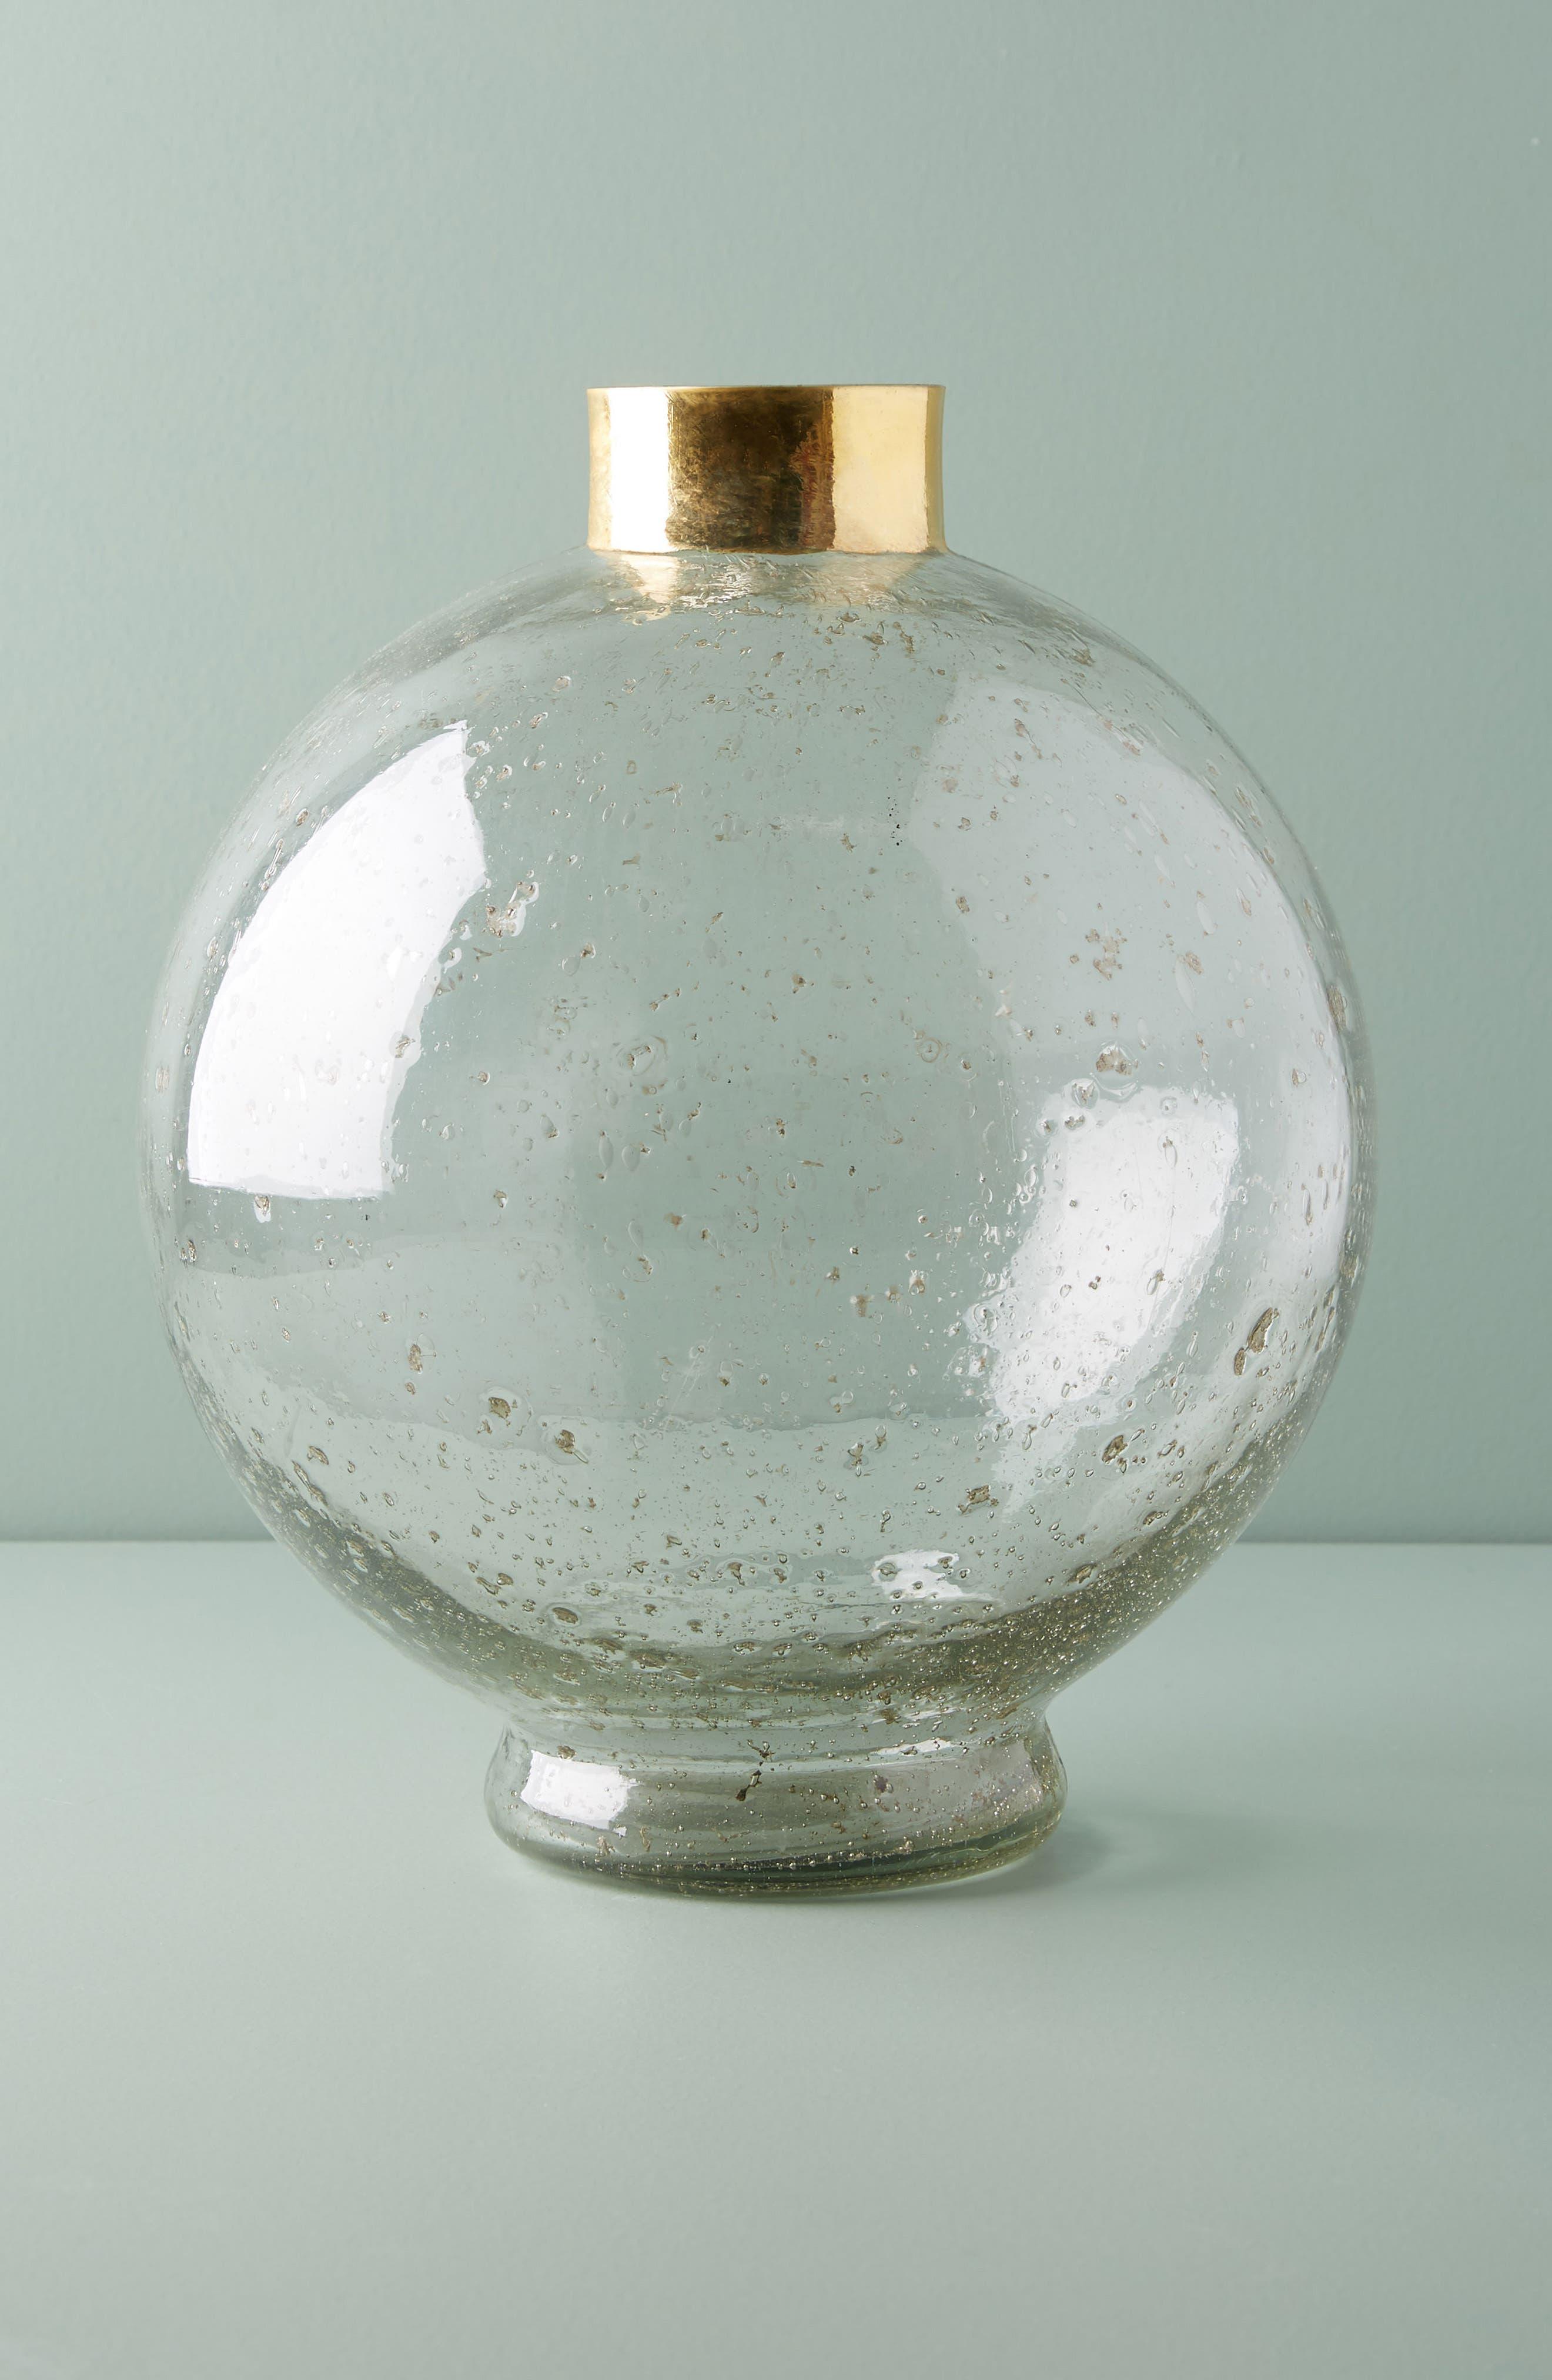 Anthropologie Gilded Large Sphere Vase